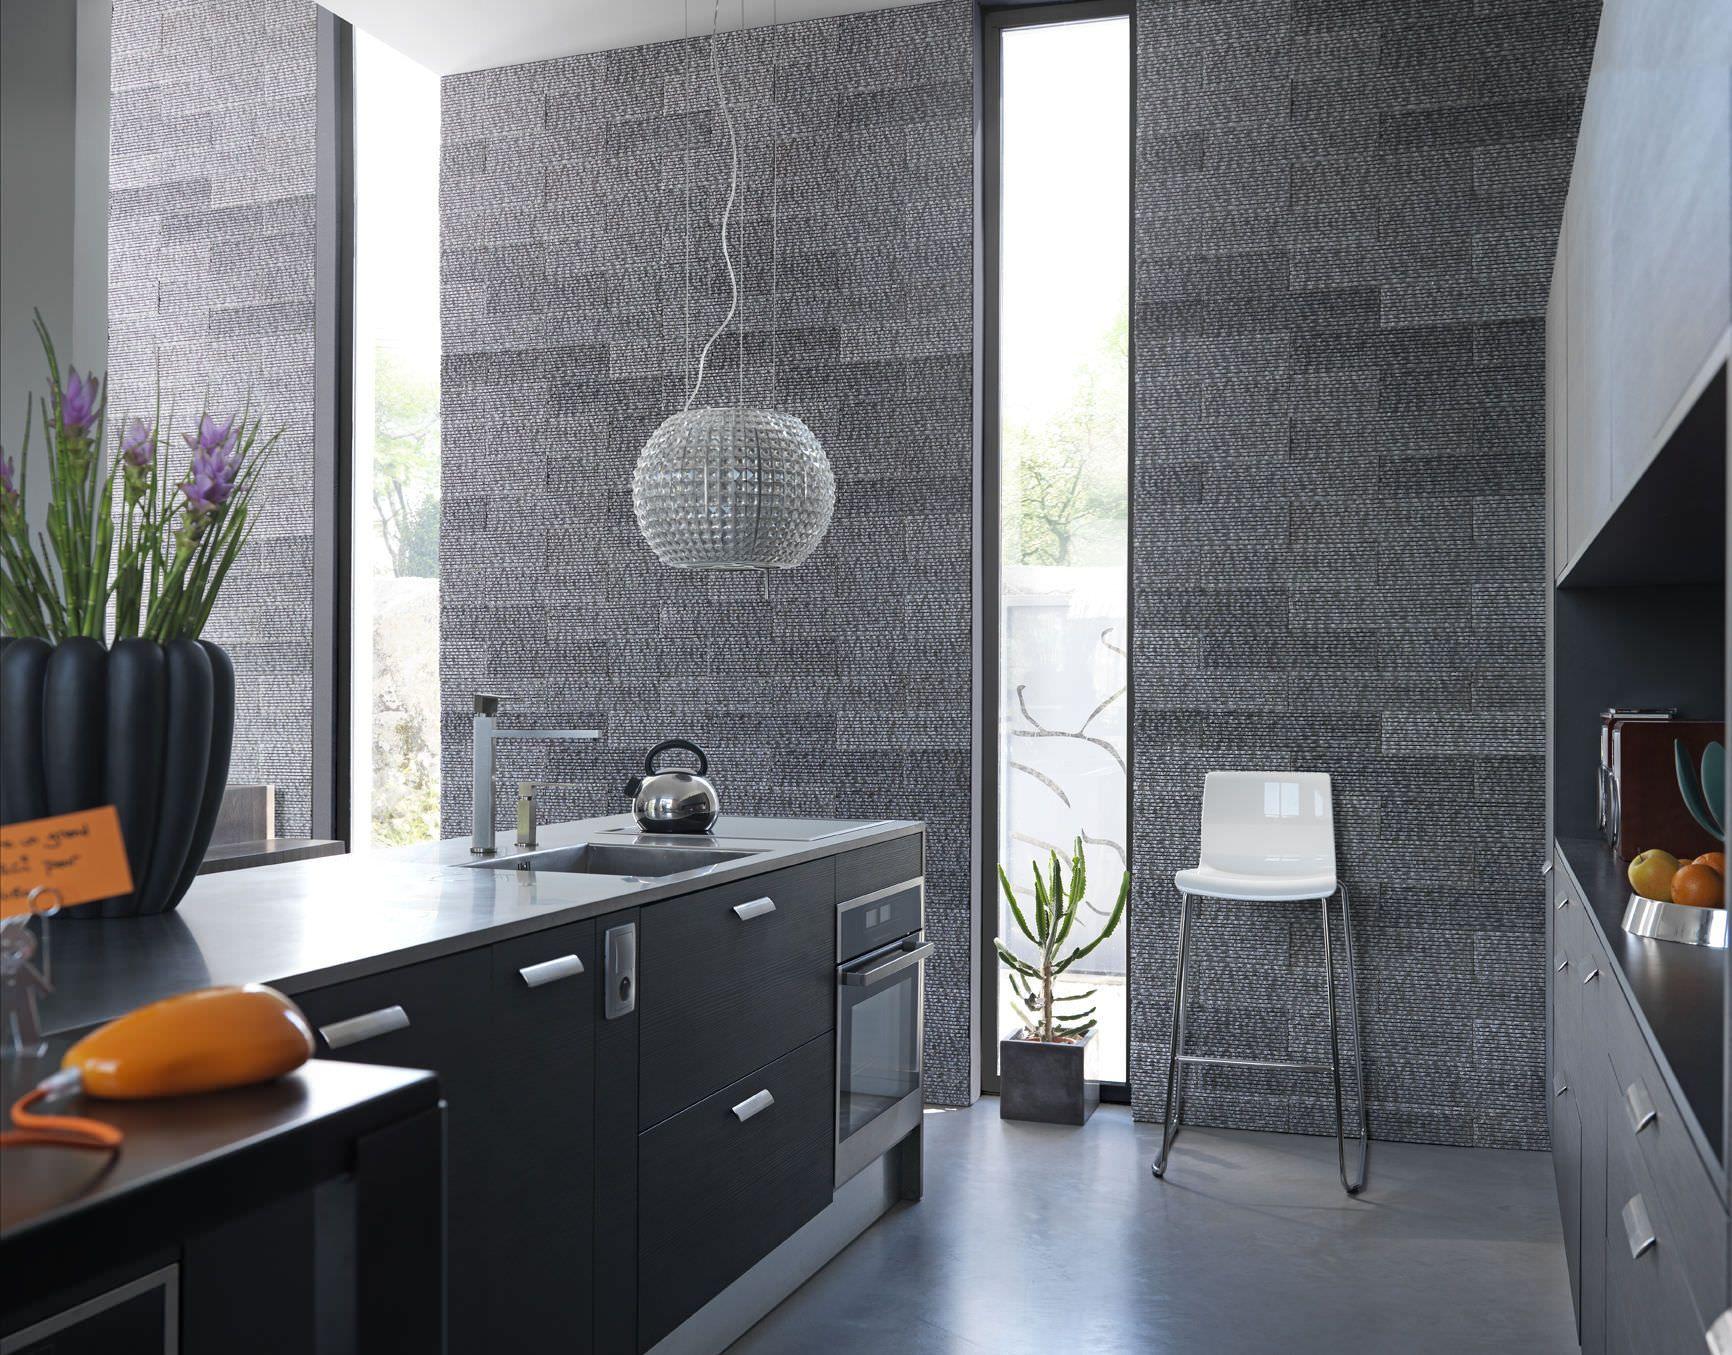 Elegant Plaquette Parement Interieure Pierre Reconstituee 60990 1633219 ( ·  Stone Wall TilesBrick ...